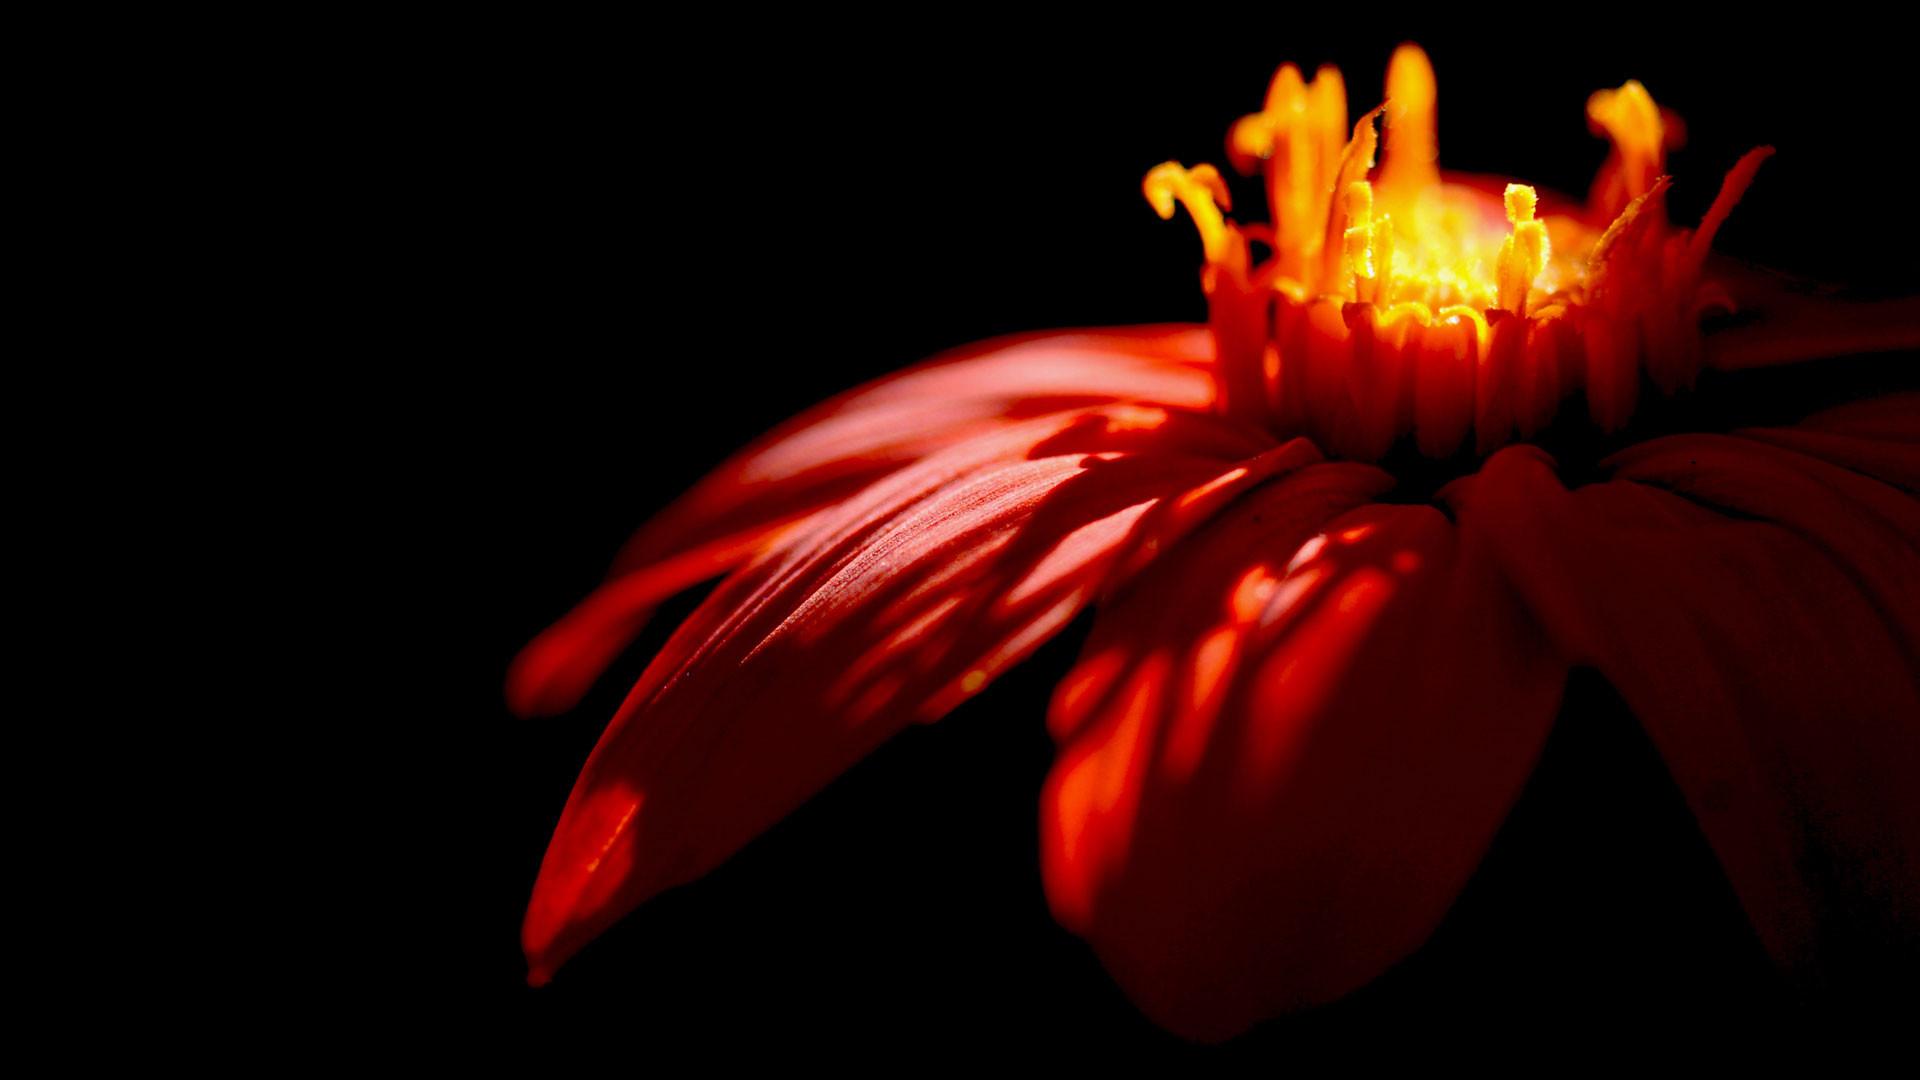 hd pics photos red flowers petals black hd desktop background wallpaper